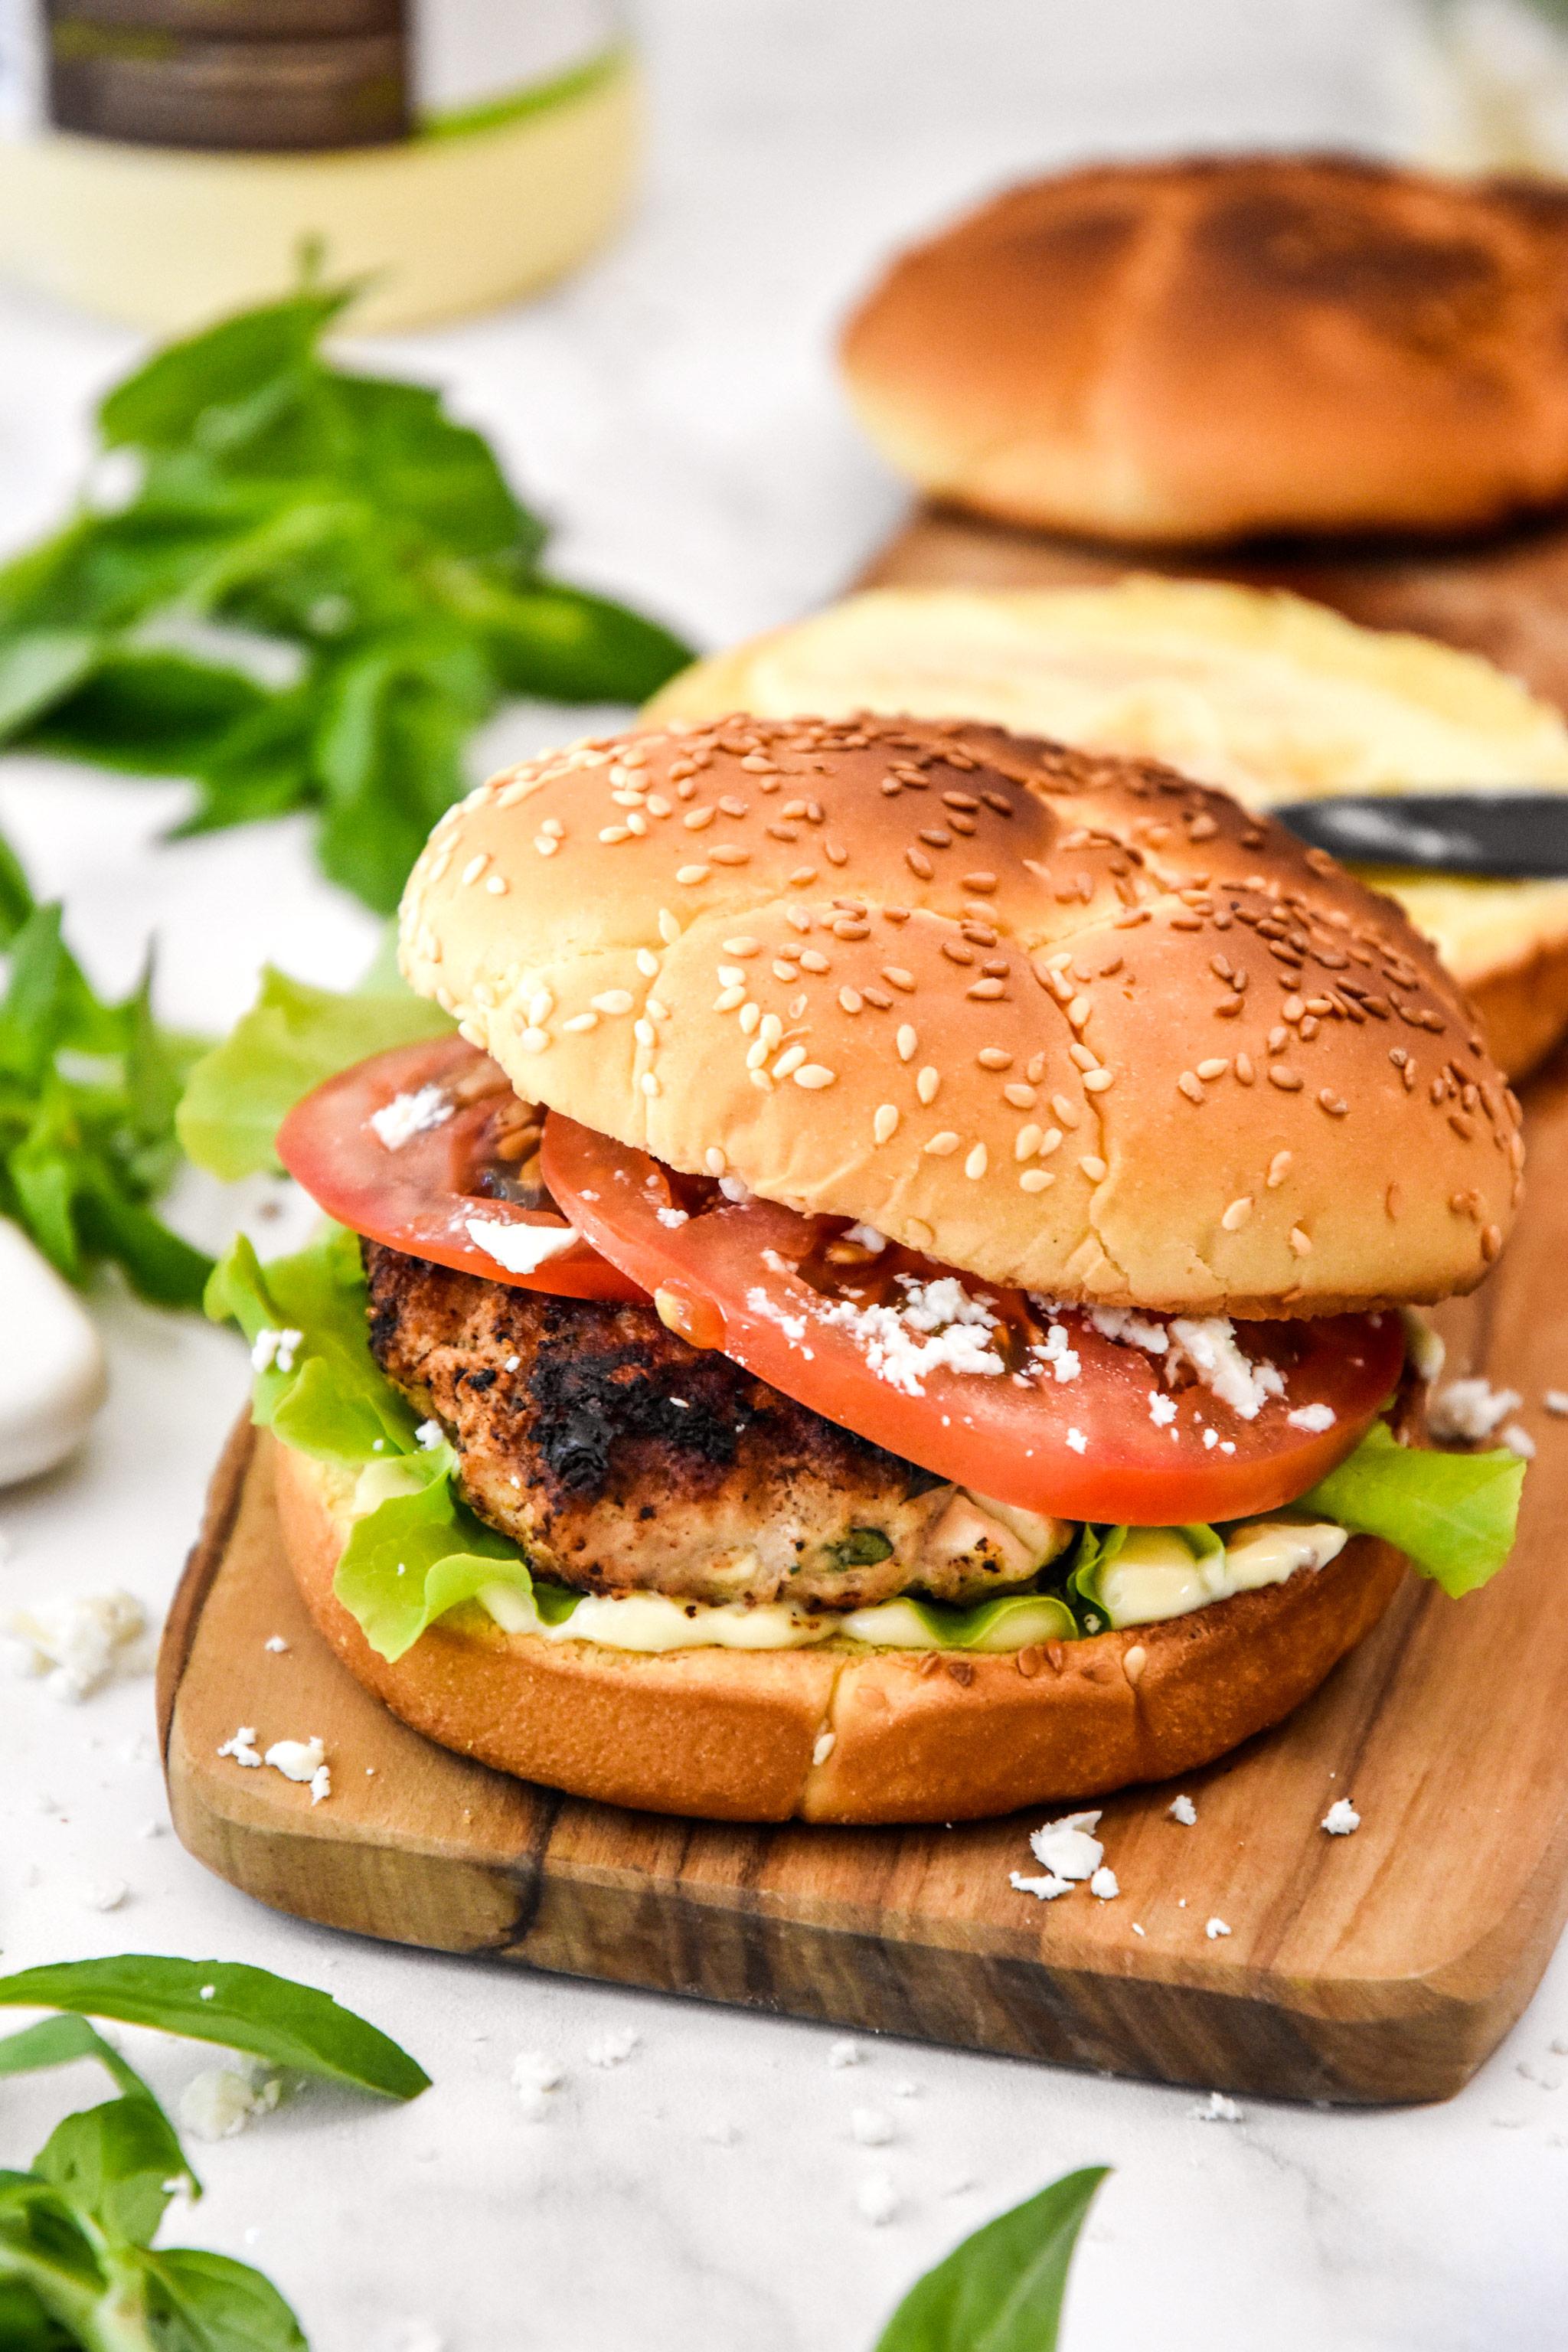 assembled feta basil turkey burger on a cutting board.